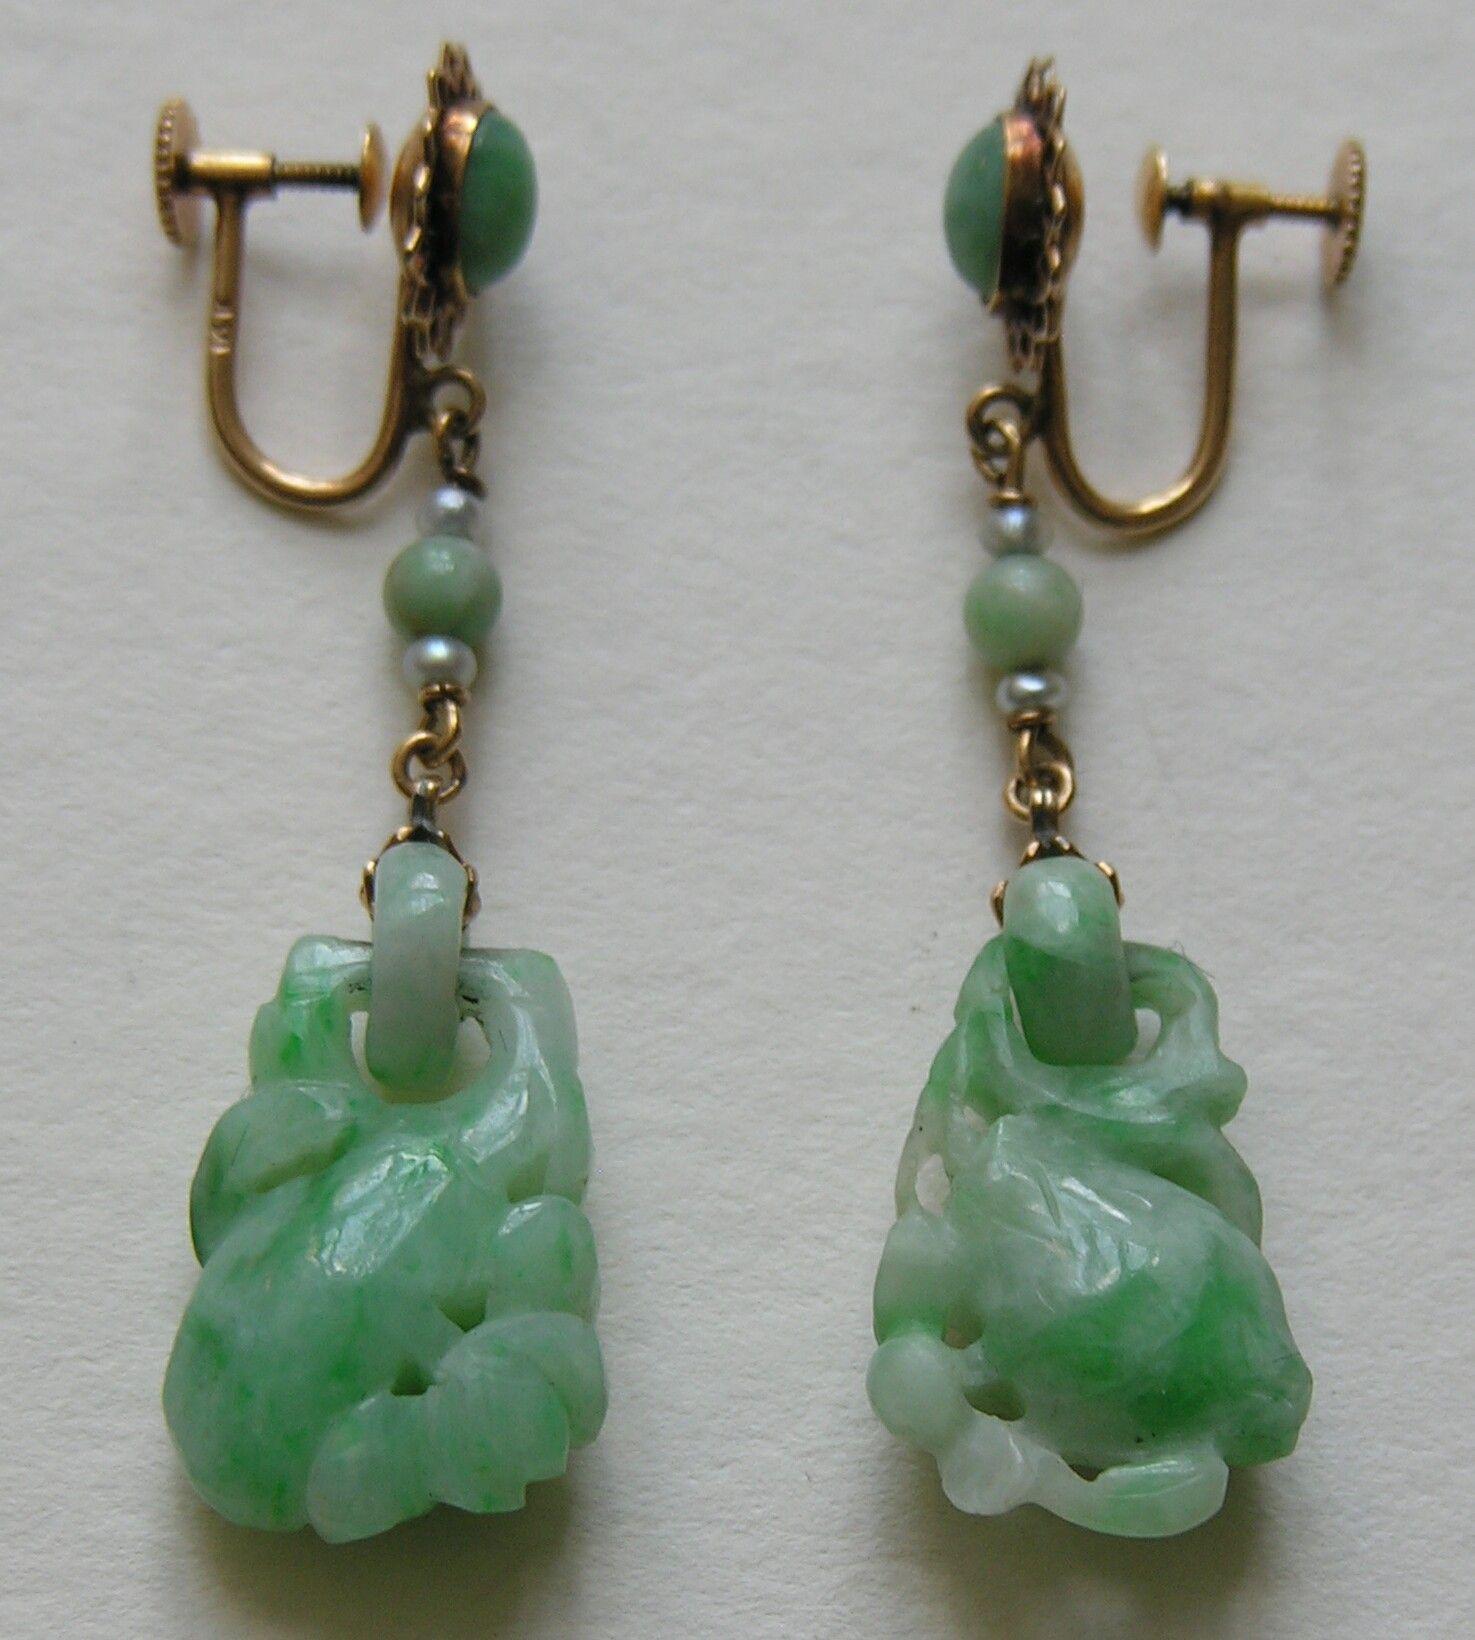 Vintage chinese carved peach jade pearl 14k earrings these vintage chinese carved peach jade pearl earrings these gorgeous chinese carved jade earrings feature a carved peach the chinese symbol for longevity buycottarizona